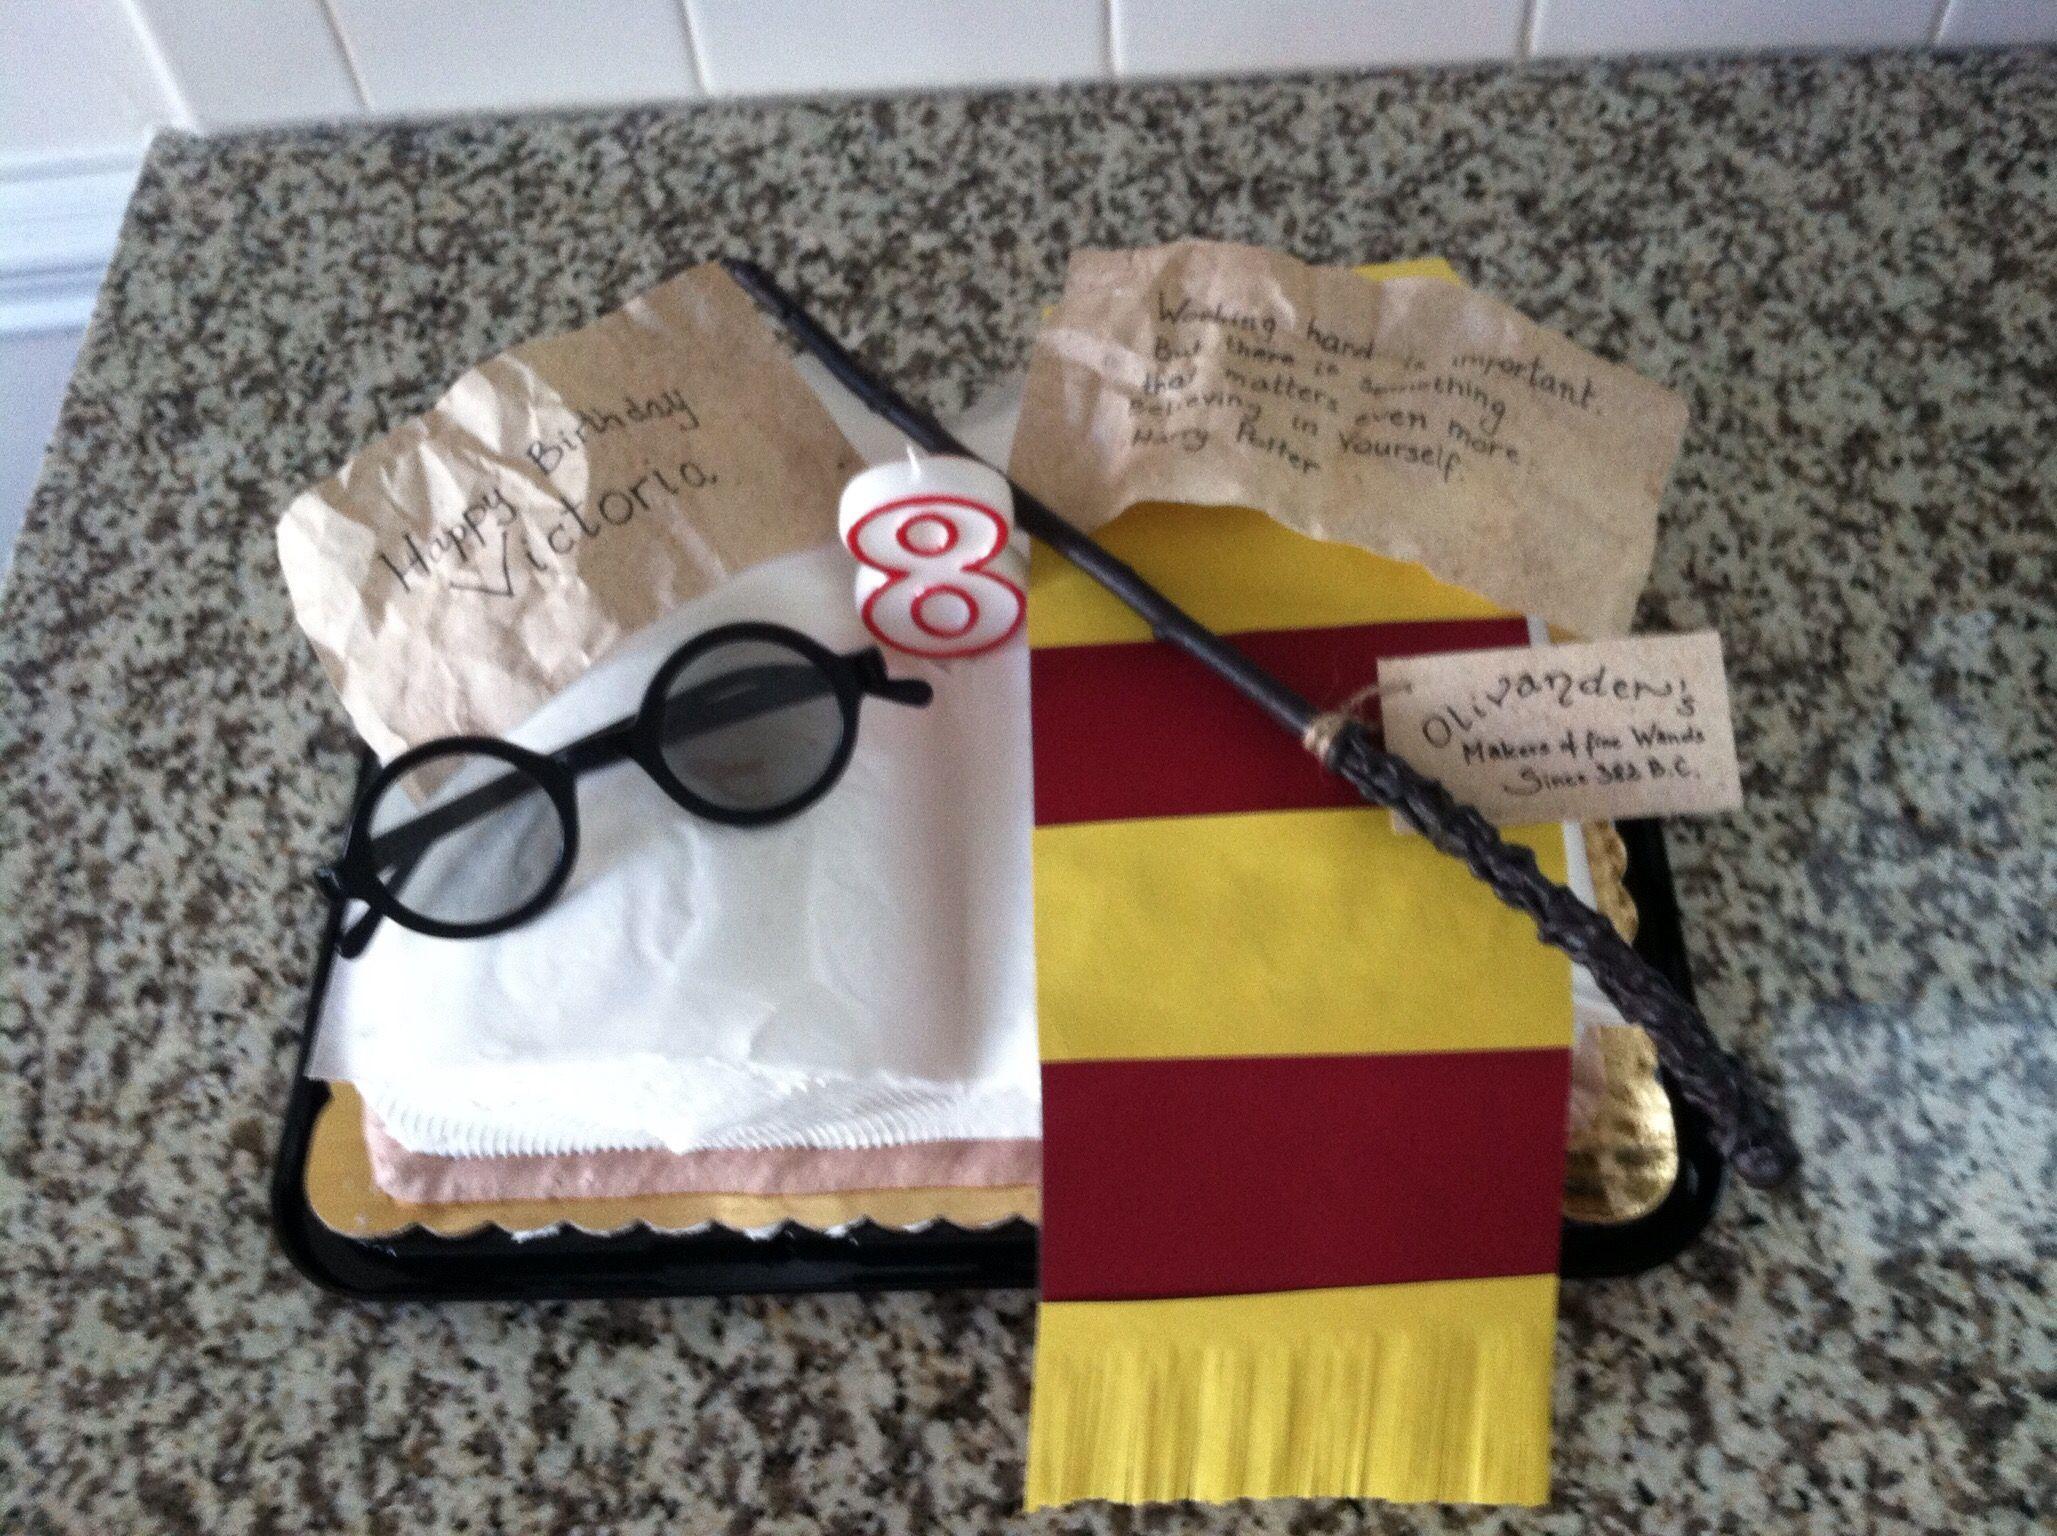 Birthday cake decor Harry Potter theme Open book shaped